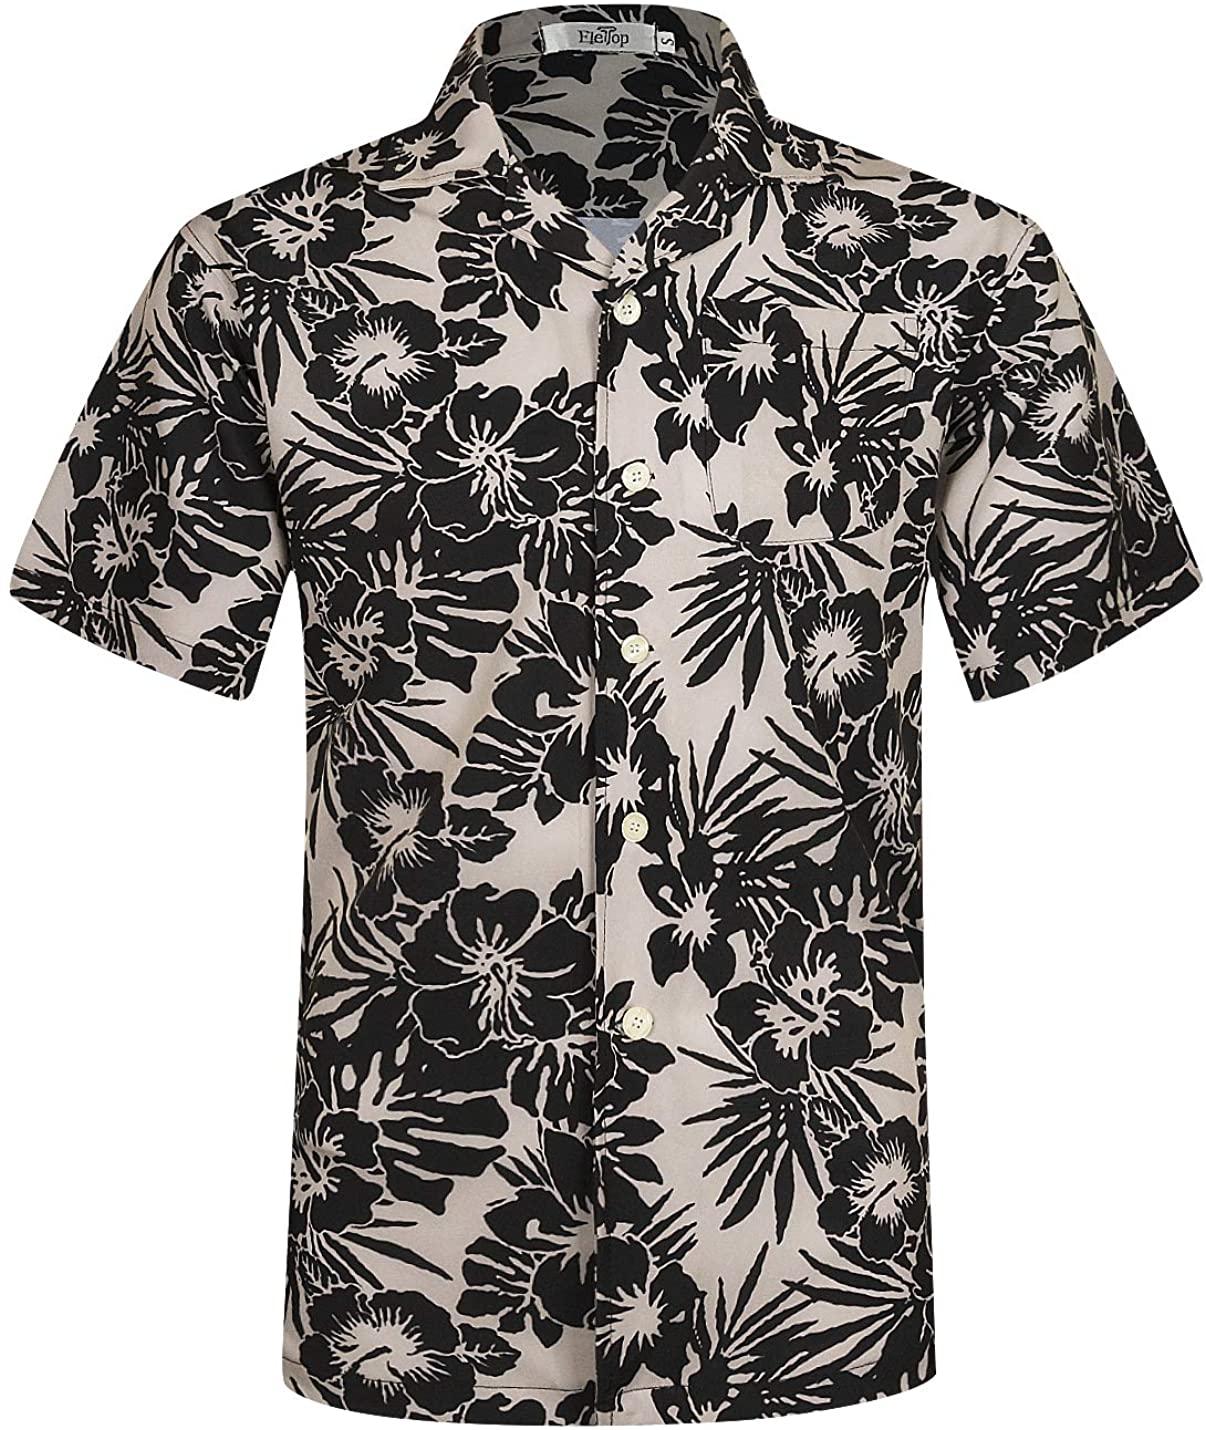 ELETOP Men's Hawaiian Shirt Short Sleeve Aloha Shirts Floral Print Beach Party Casual Shirts L1